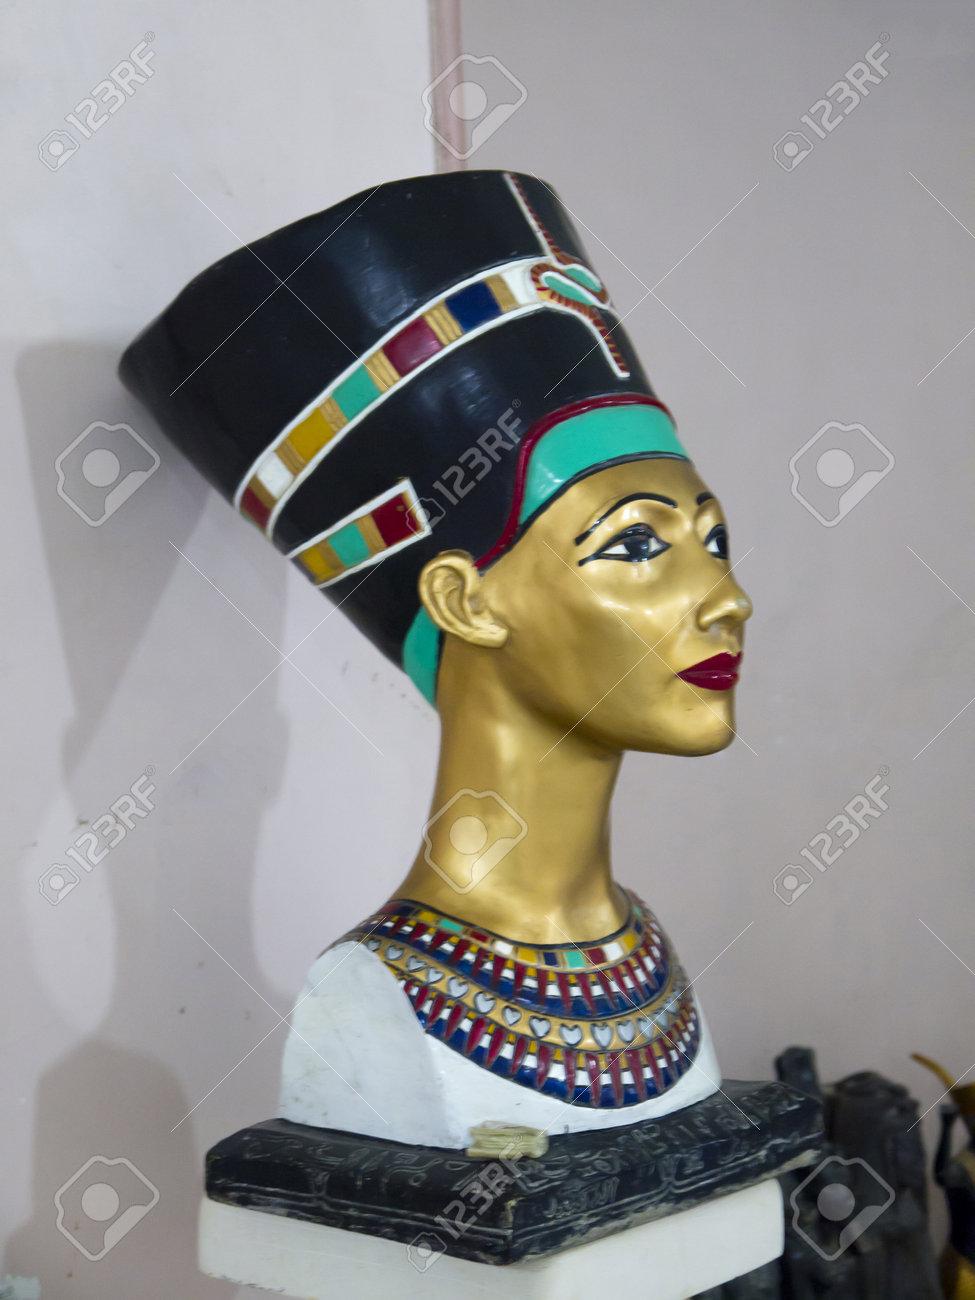 Copy of Statue of Egyptian Queen Nefertiti